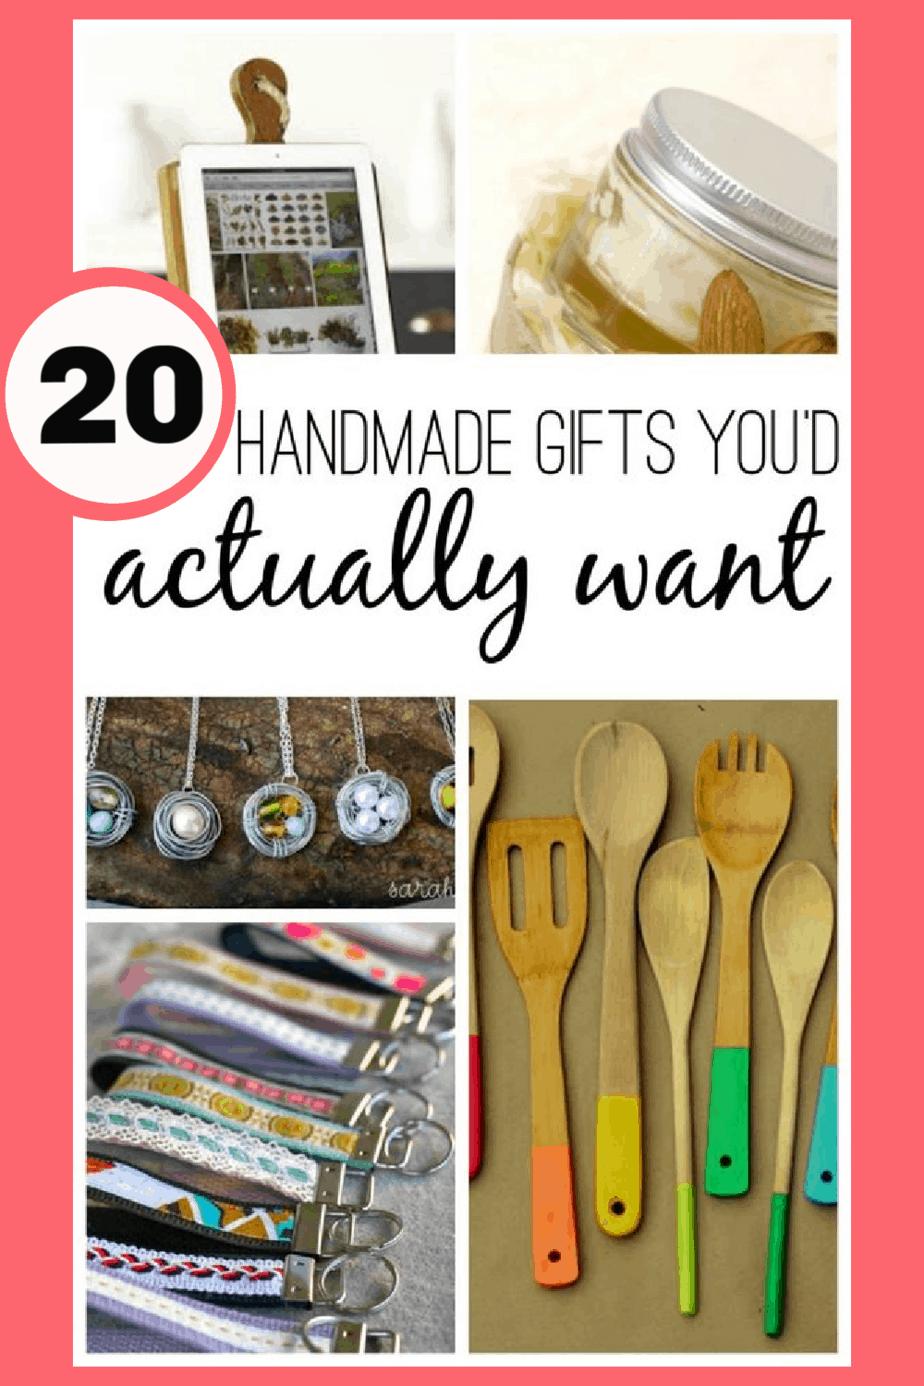 handmade gifts made easy